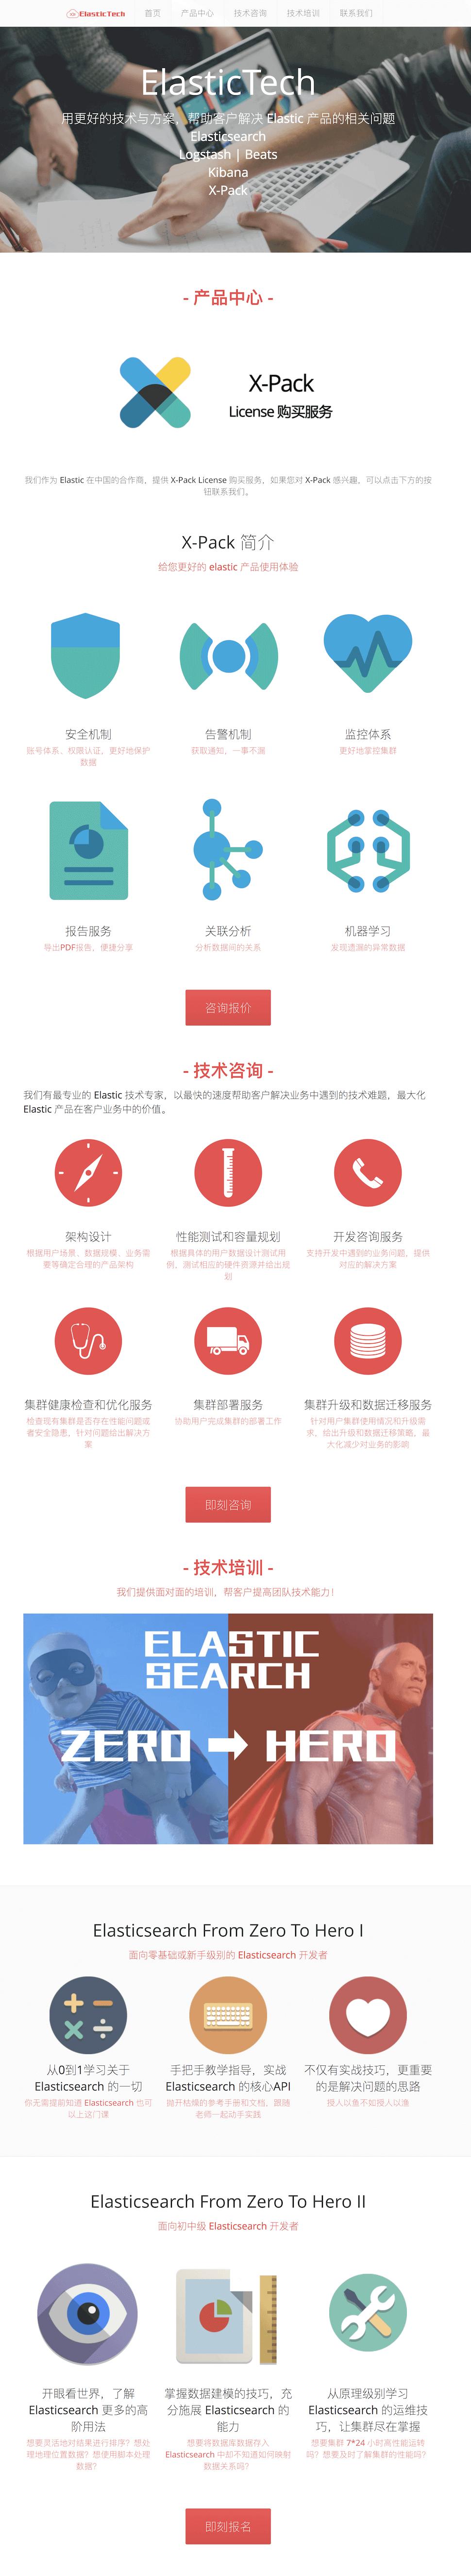 site_crop-min_2_(1).png